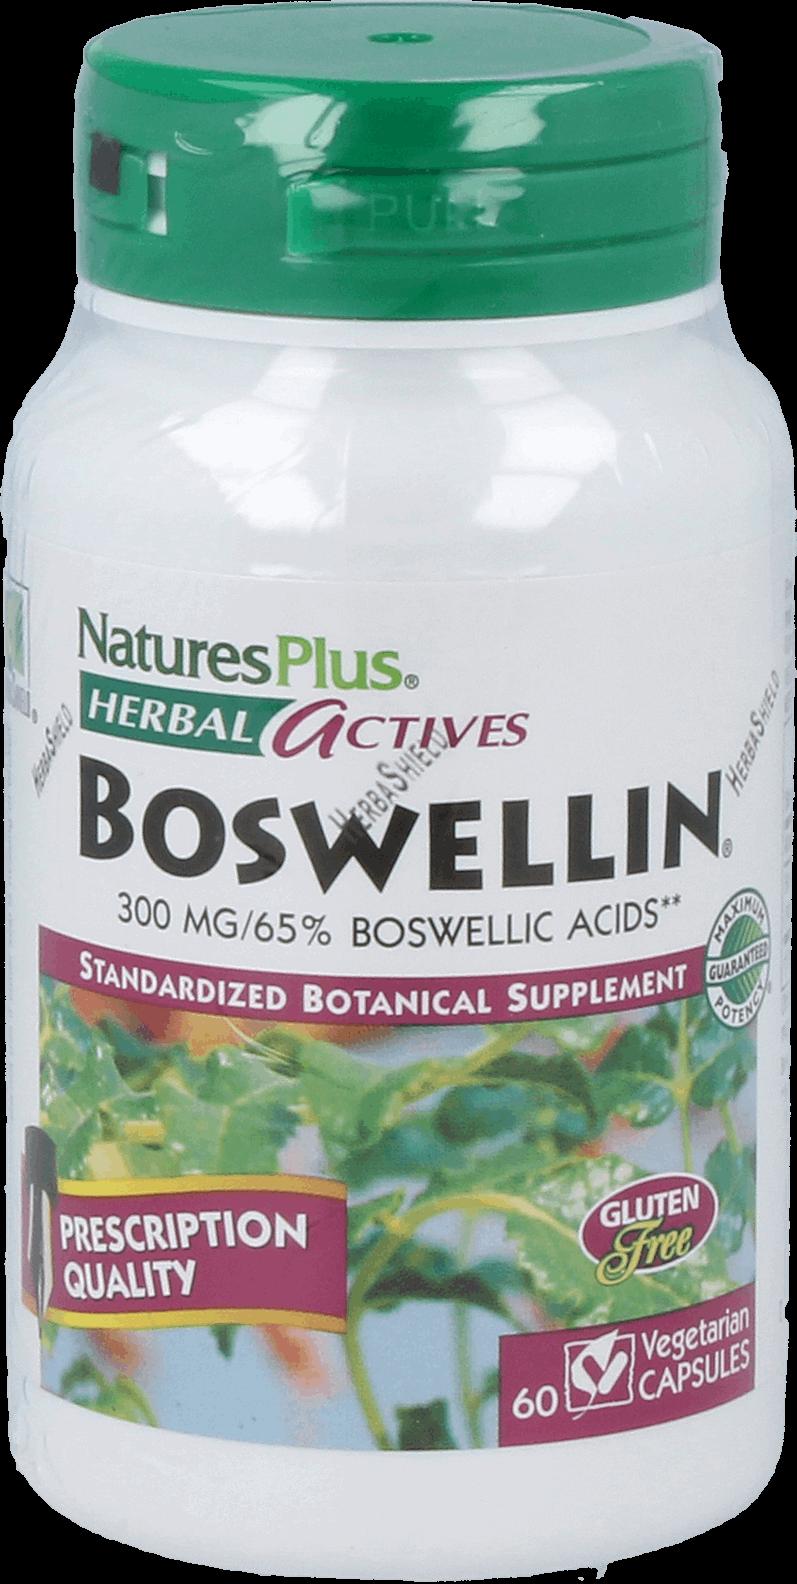 Boswellin® 300 mg